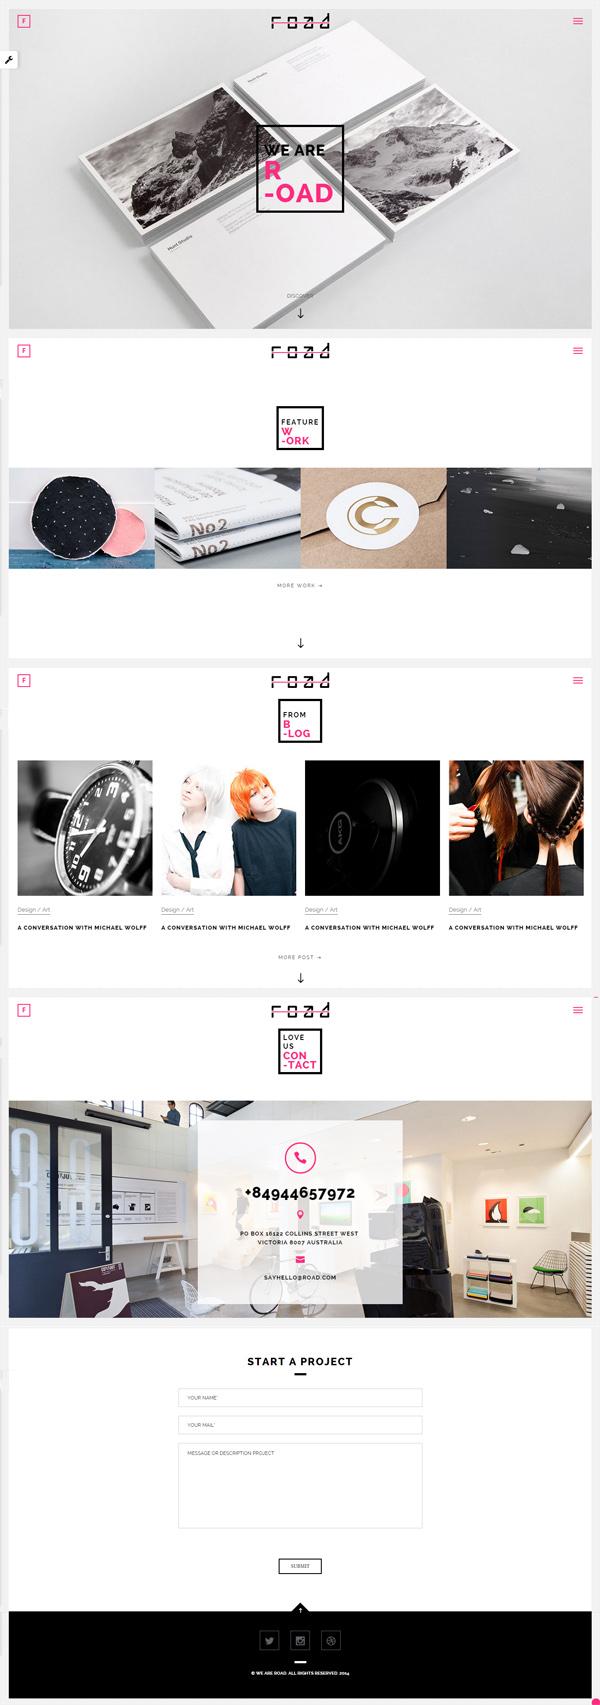 Road - Fullscreen Mutipurpose HTML5 Template